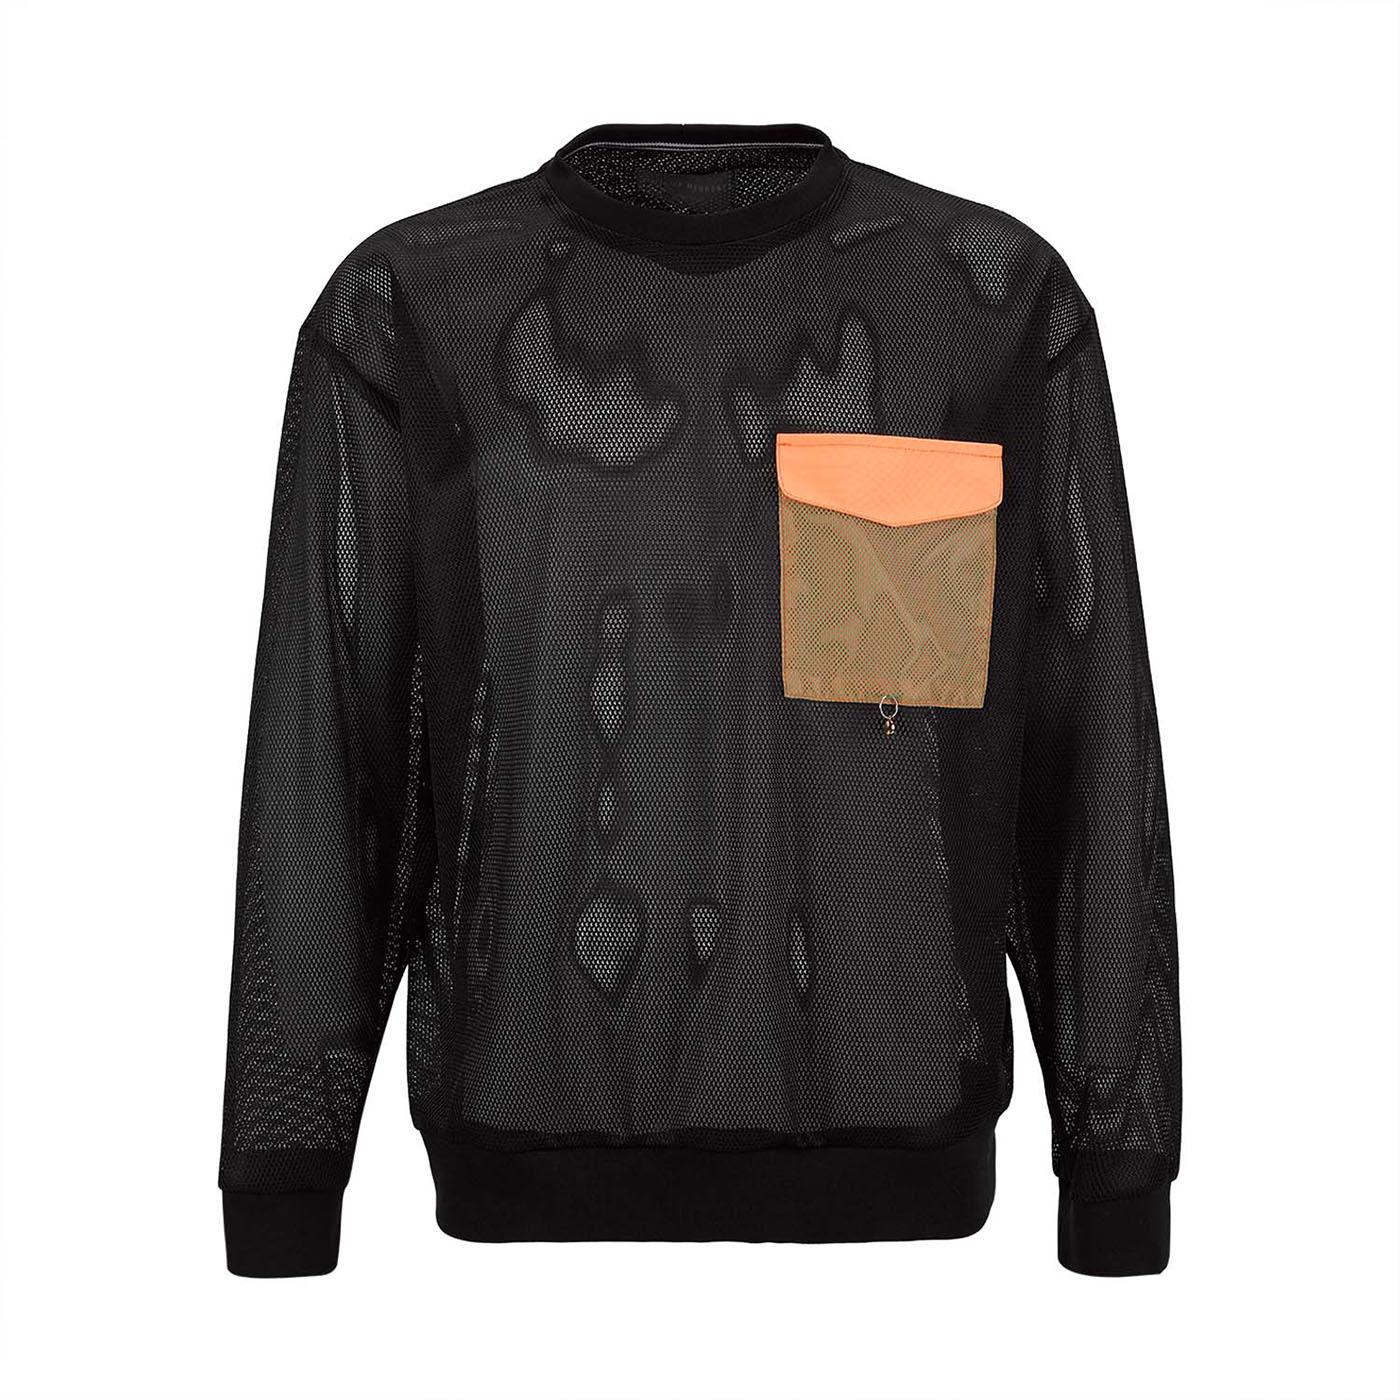 Peek a Boo Sweater Estelita Mendonça